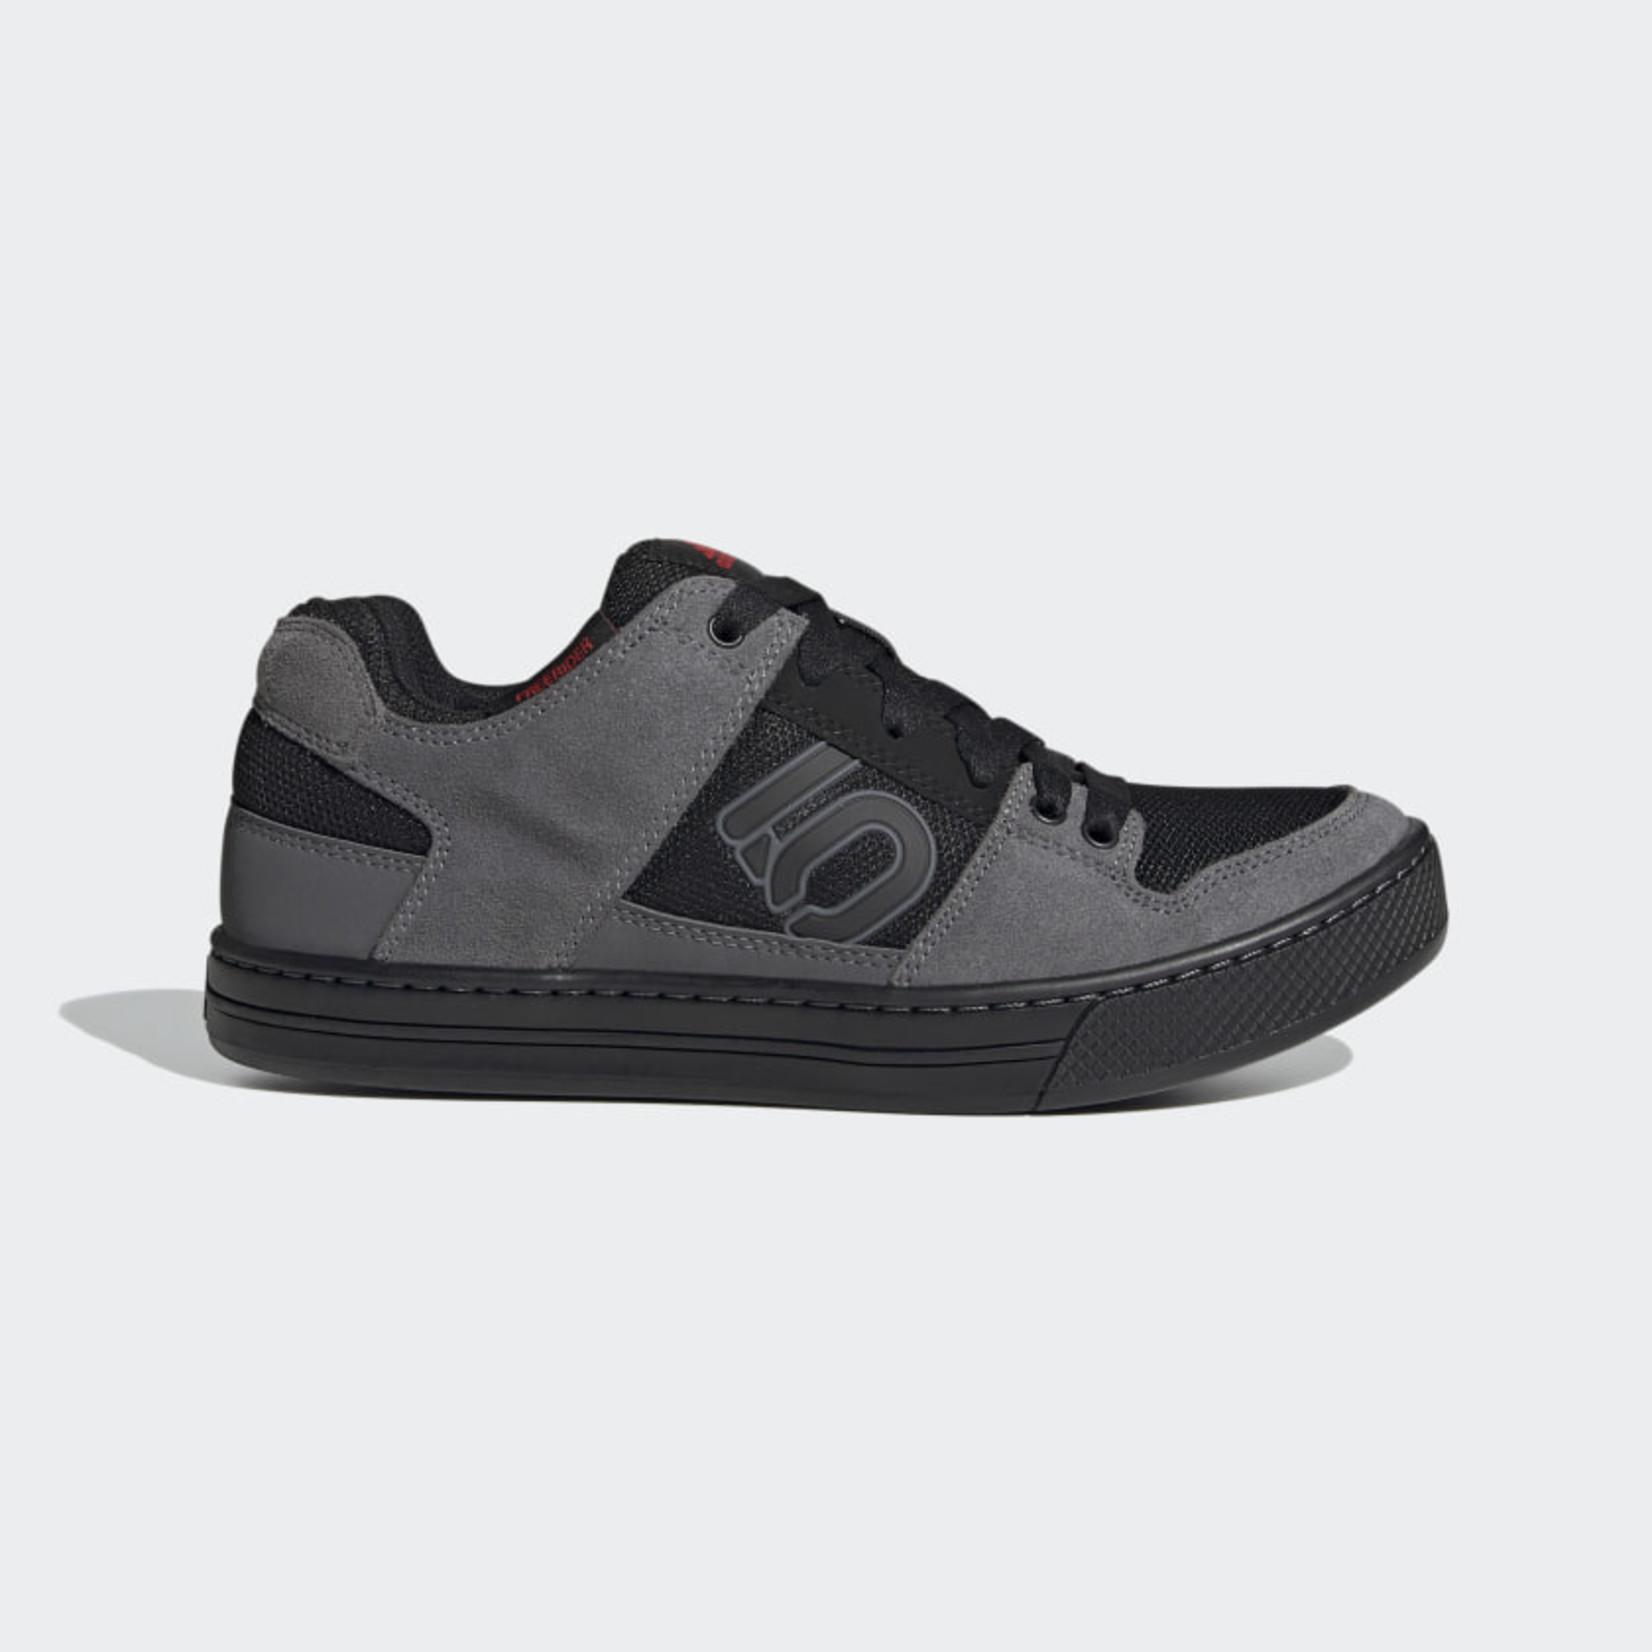 Adidas Freedrider